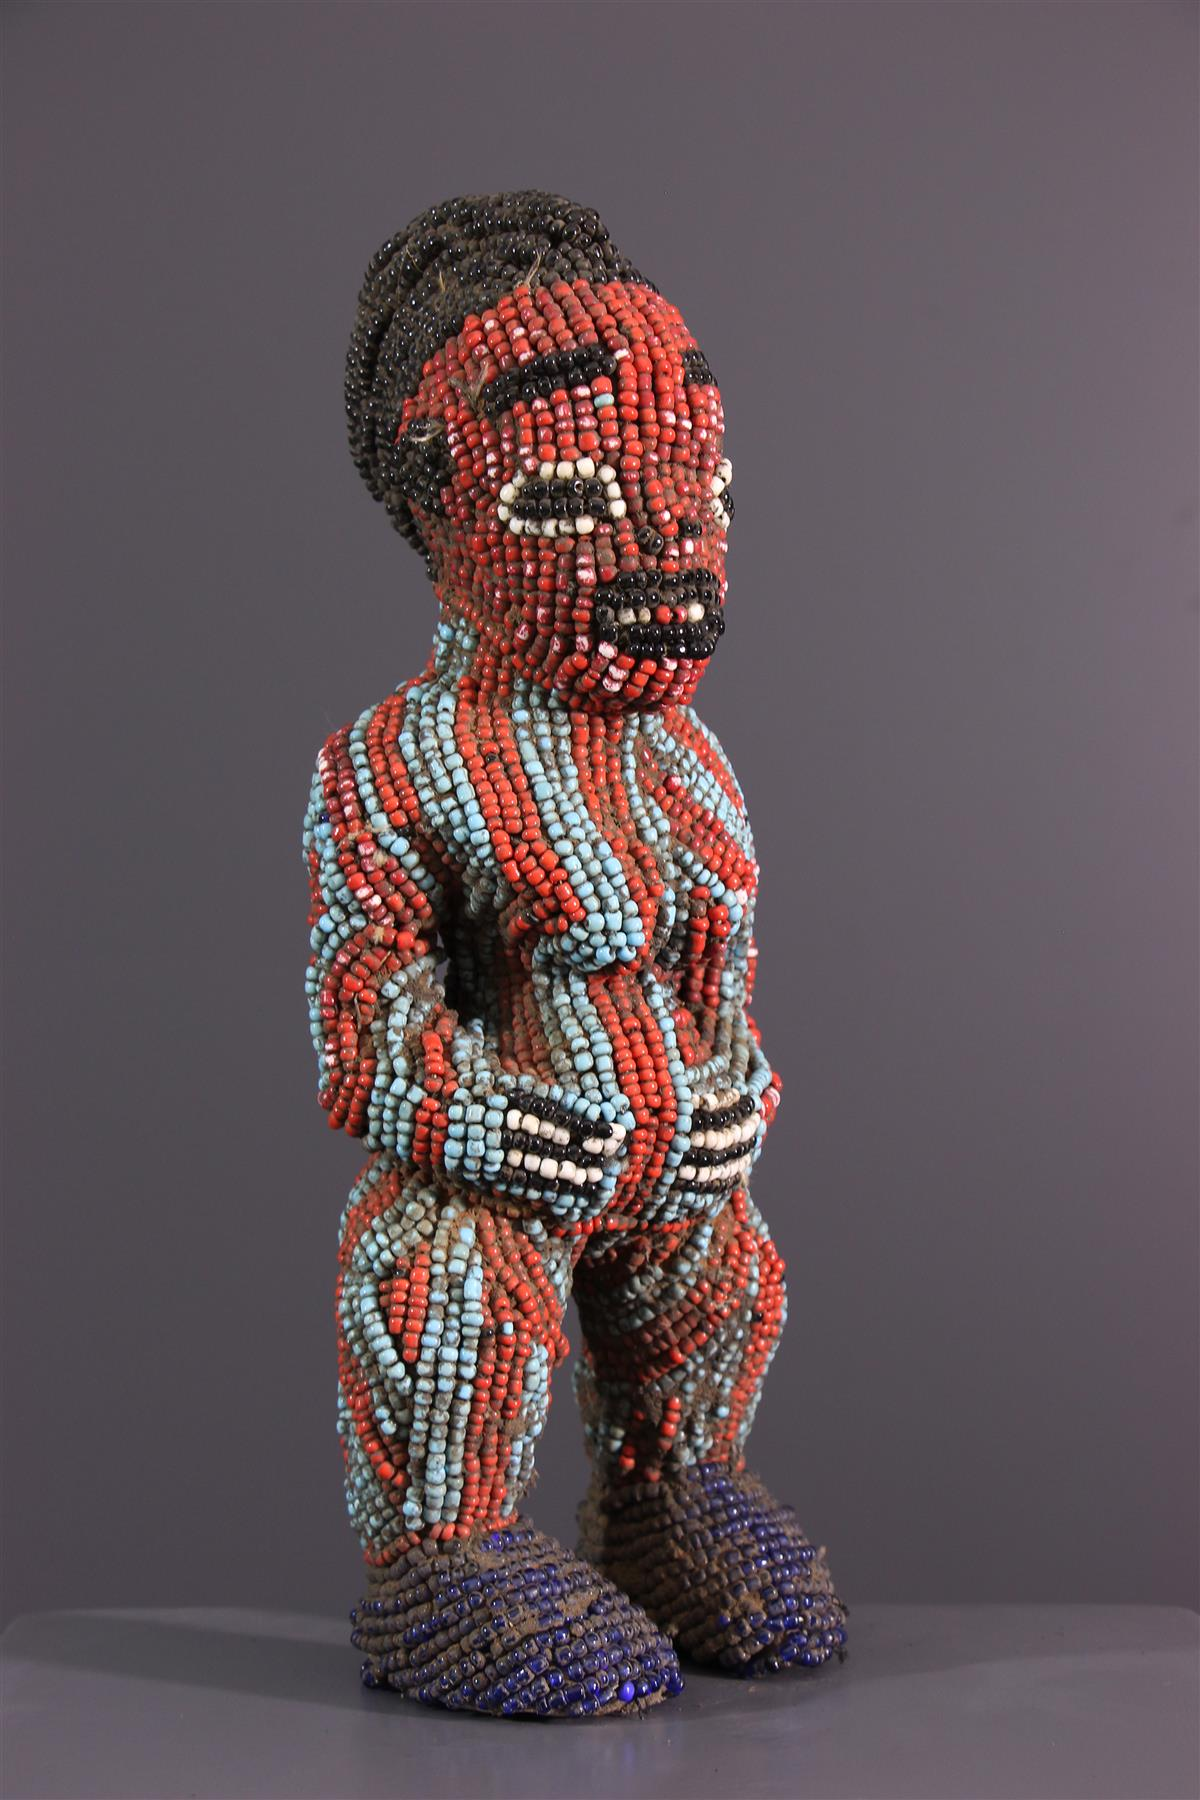 Statue Cameroon - African art